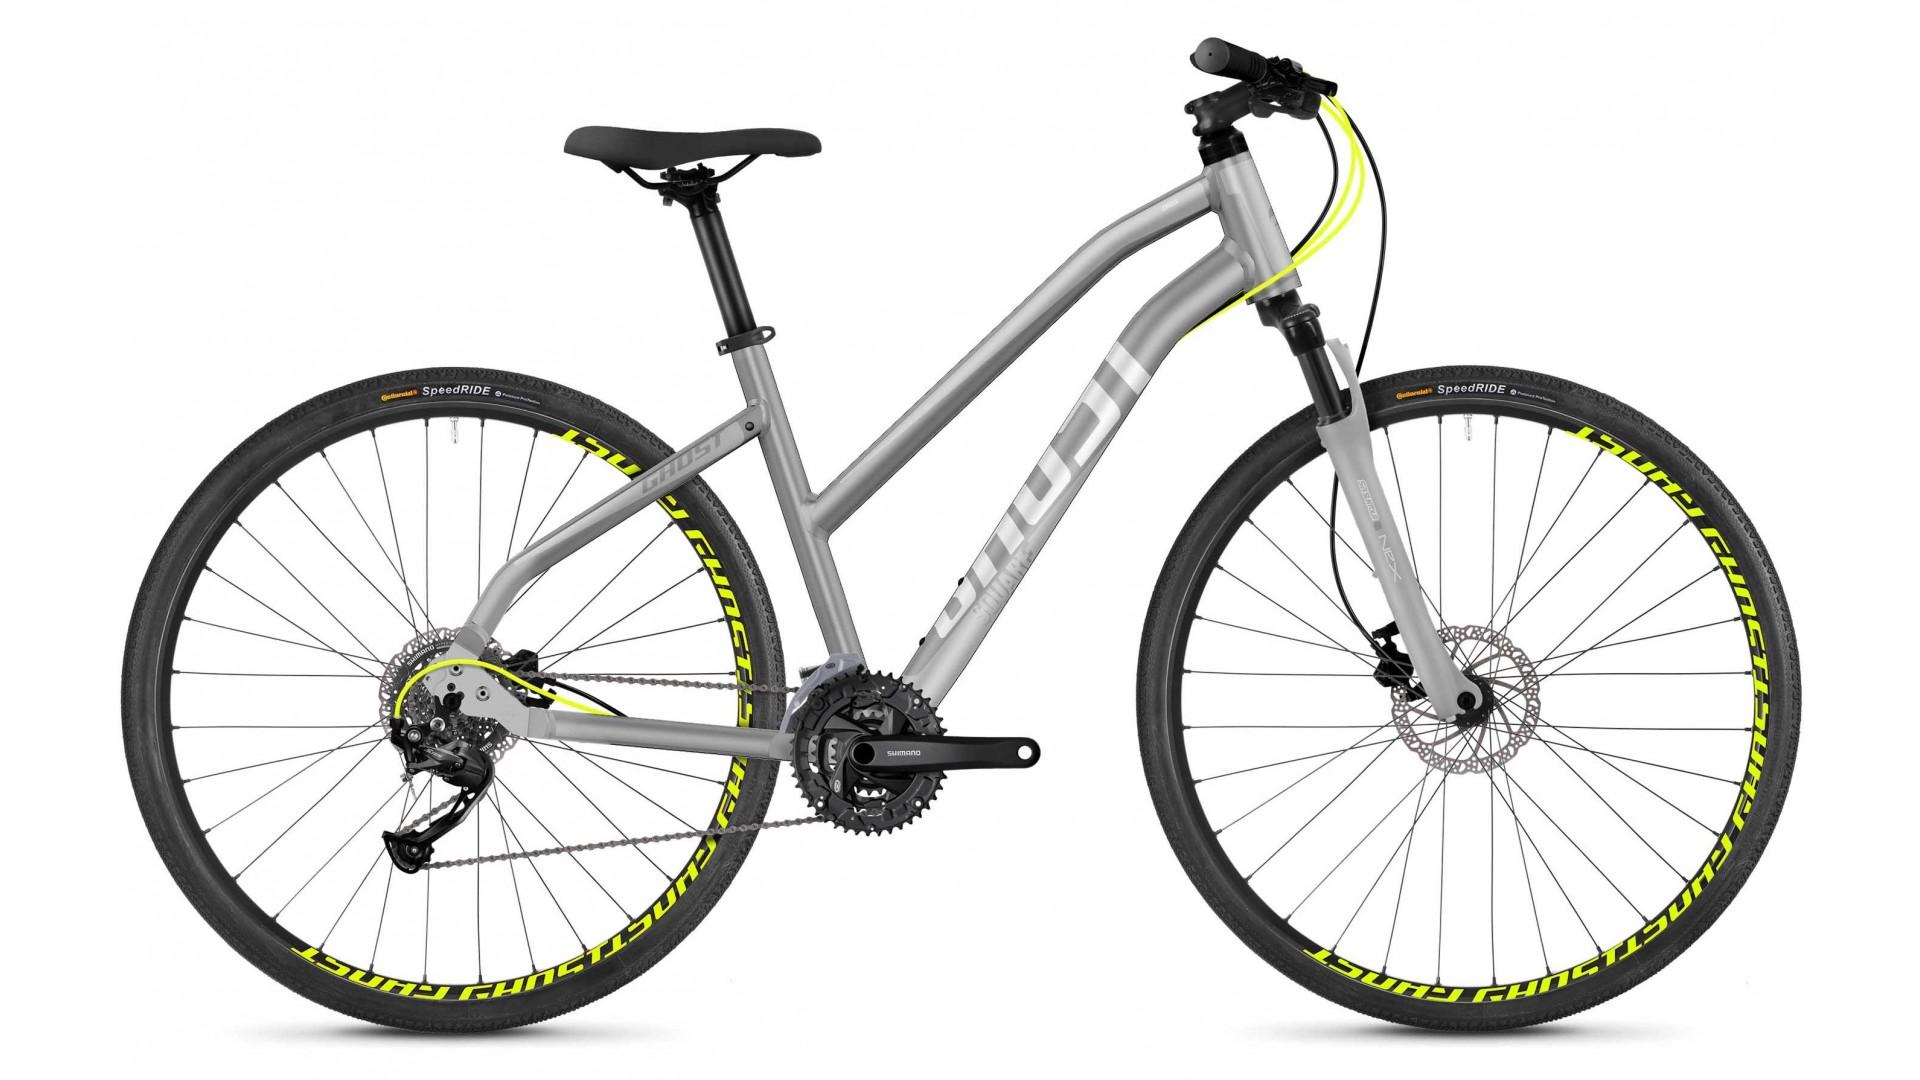 Велосипед  GHOST Square Cross 1.8 AL W palladium silver / iridium silver / neon yellow год 2018